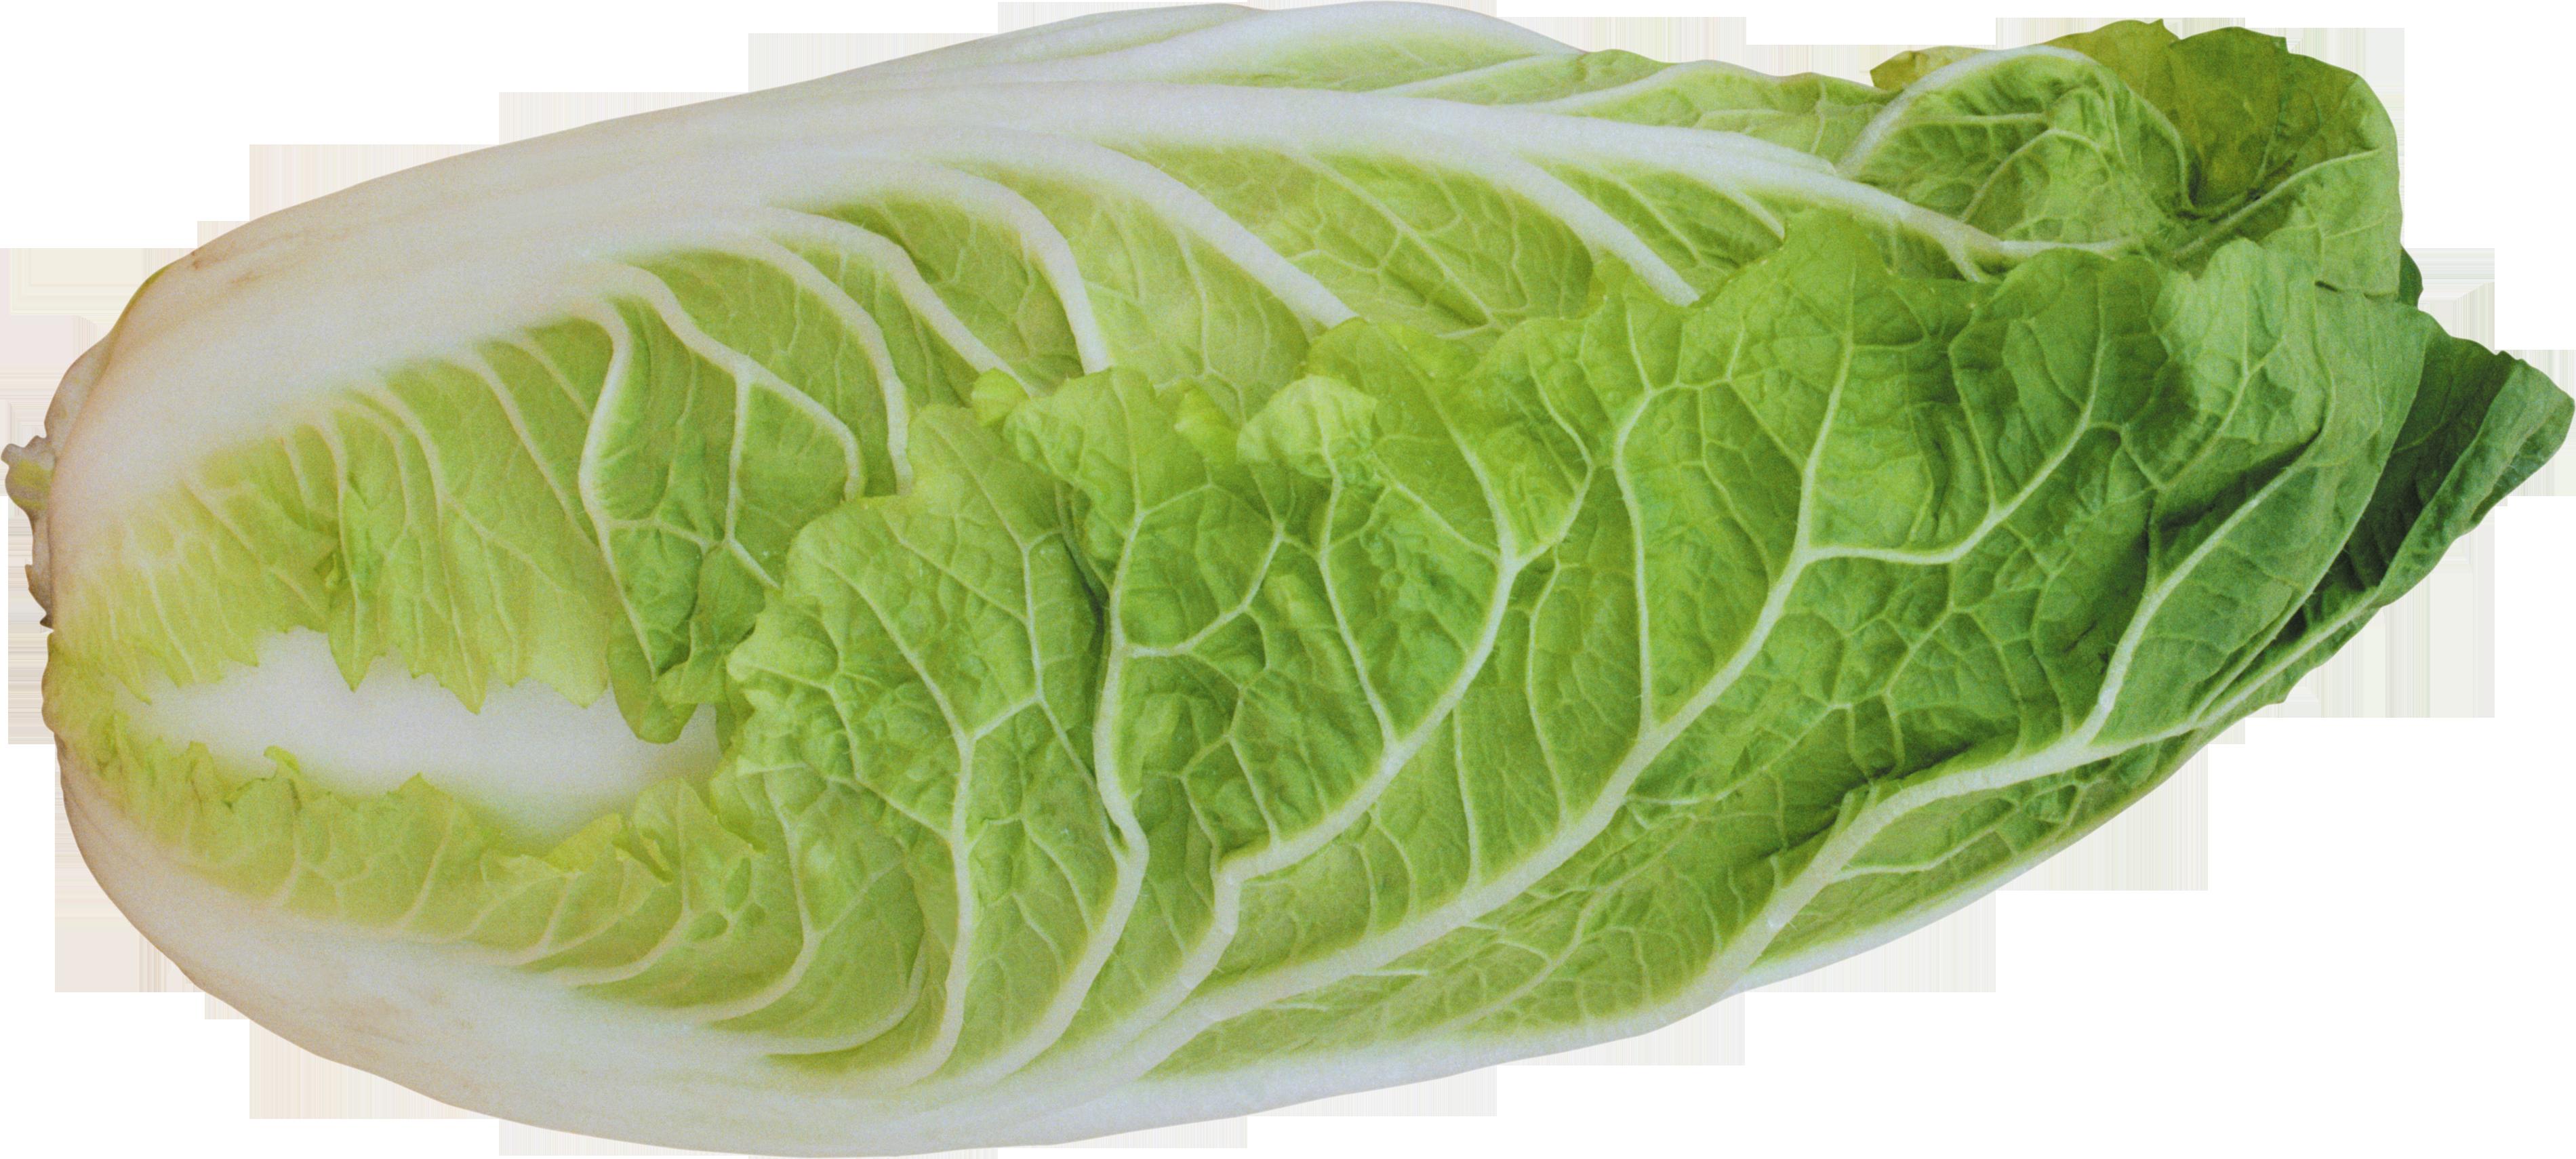 Lettuce clipart head lettuce. Salad png images free